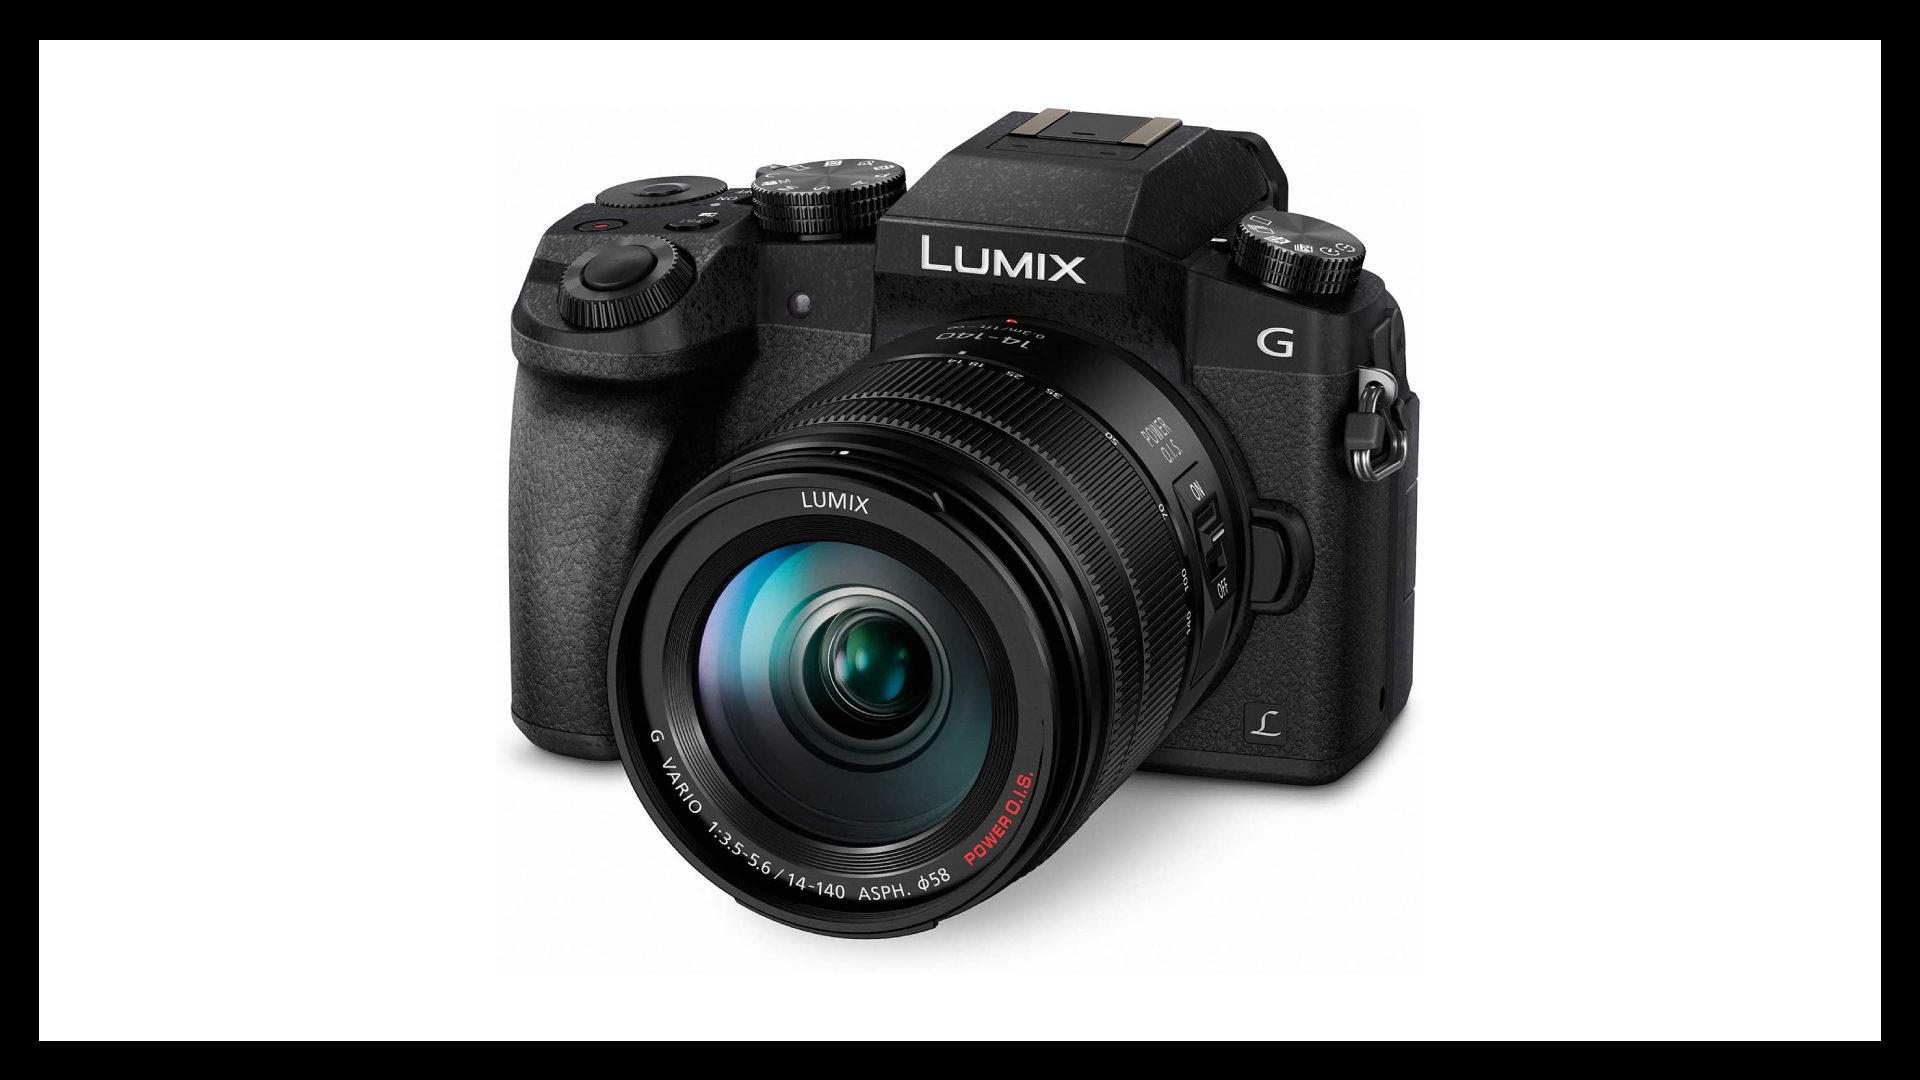 Panasonic LUMIX G7 Best Vlogging Camera With Flip Screen